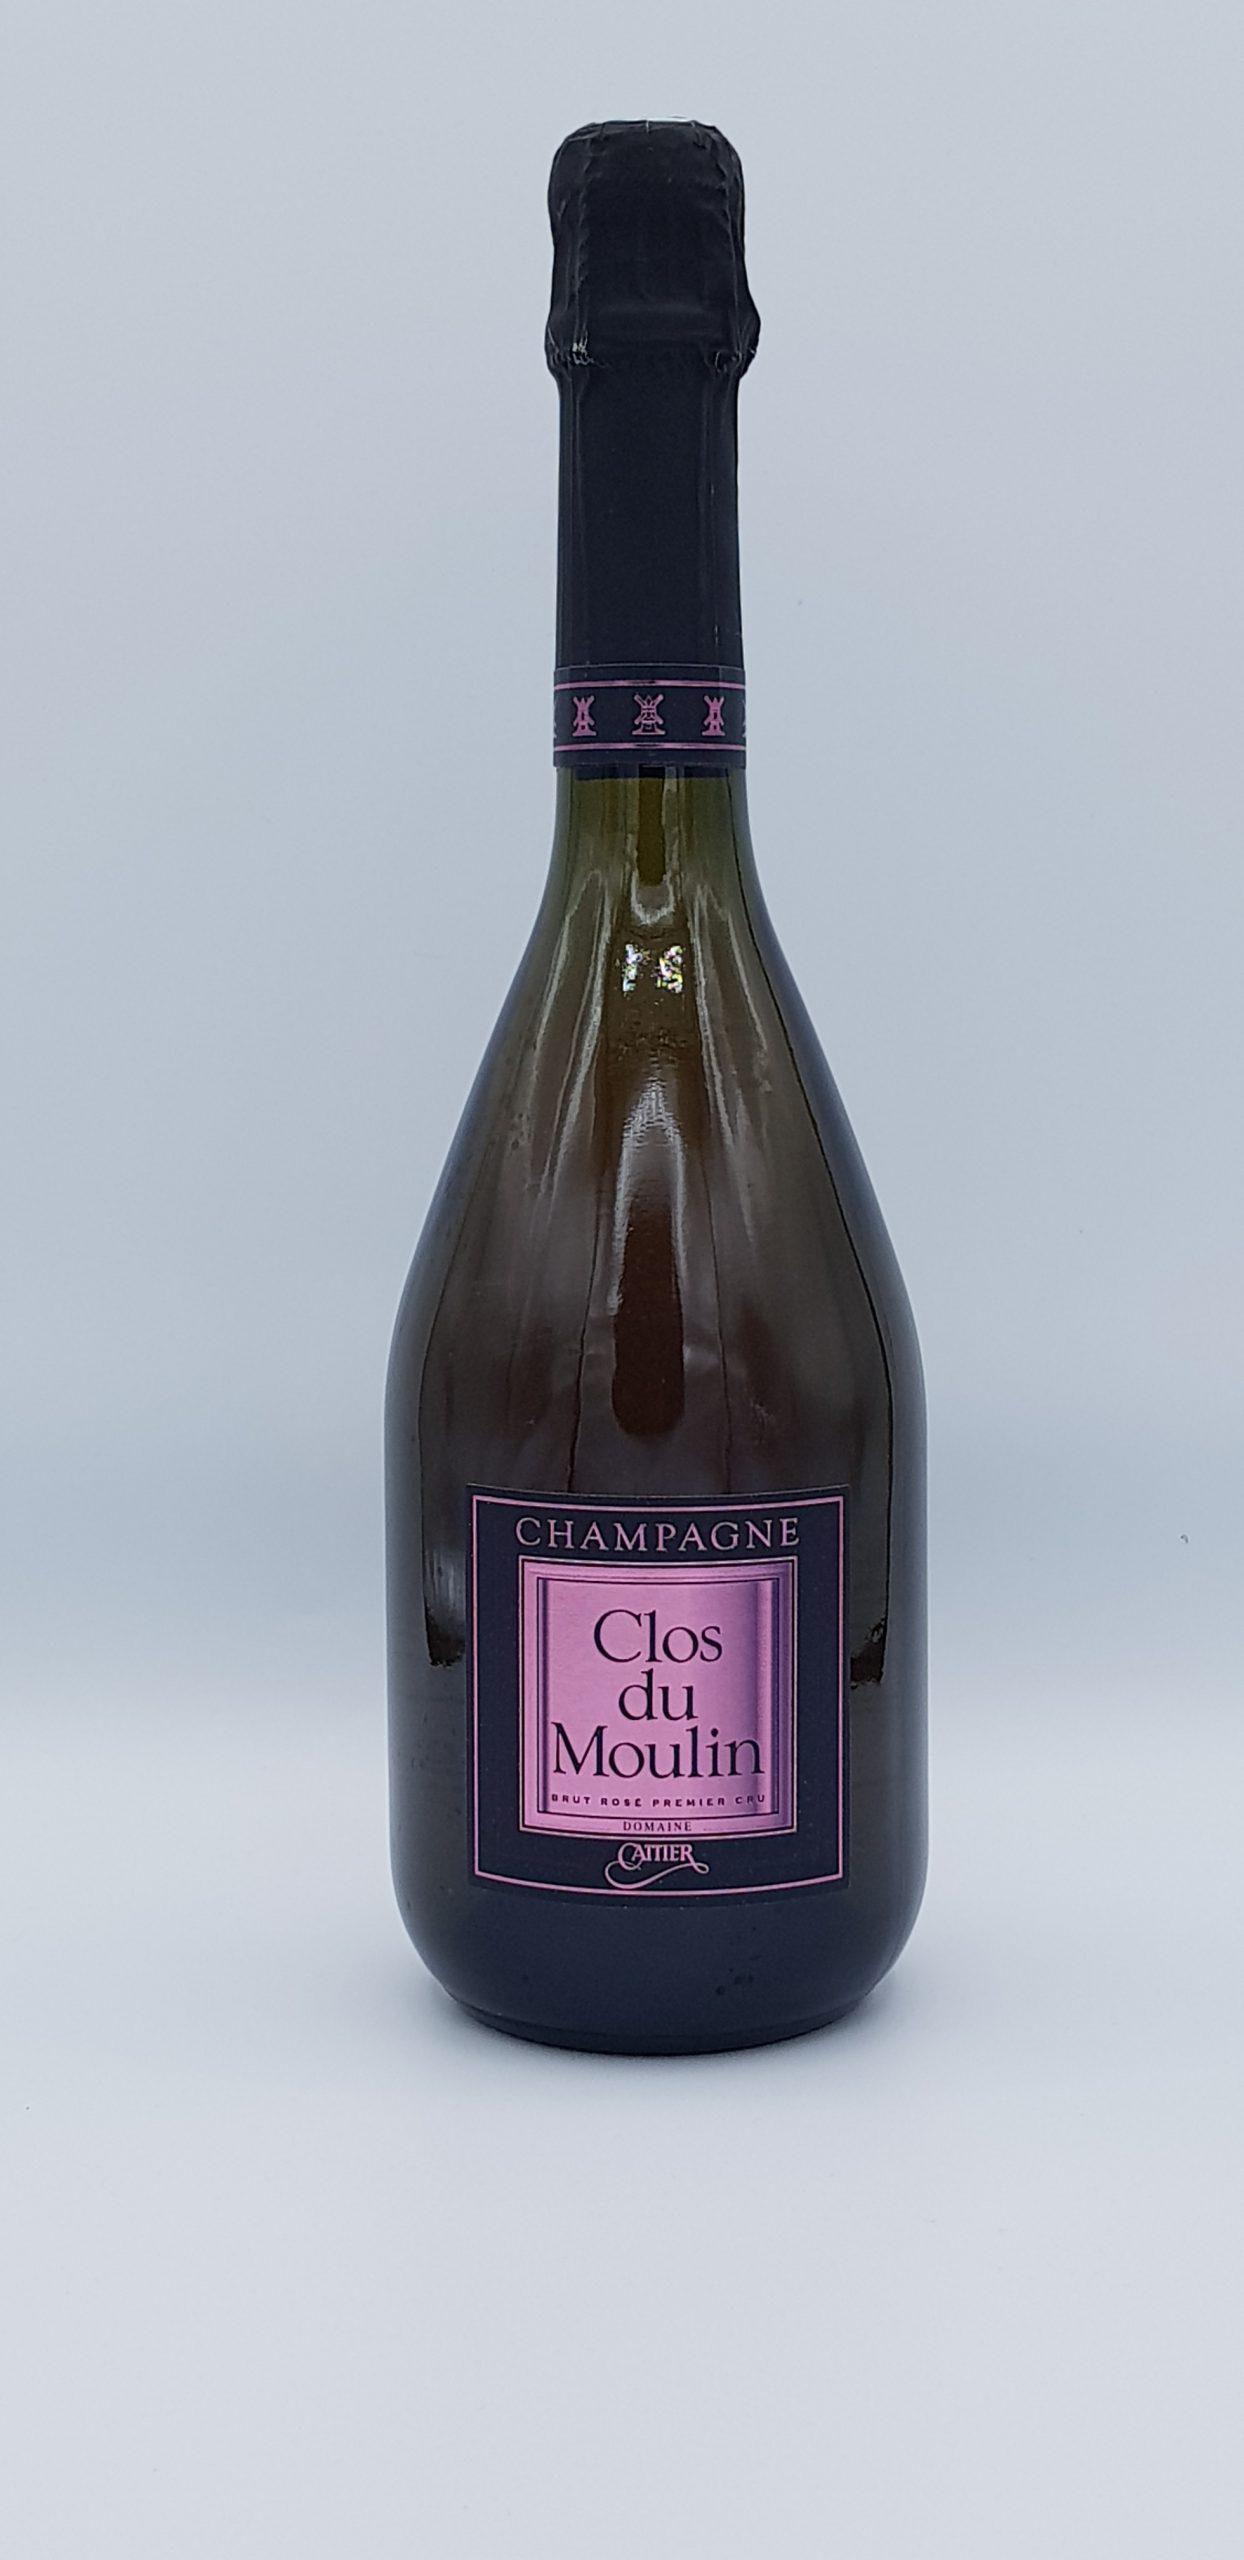 Champagne Cattier Brut Clos Du Moulin Rose